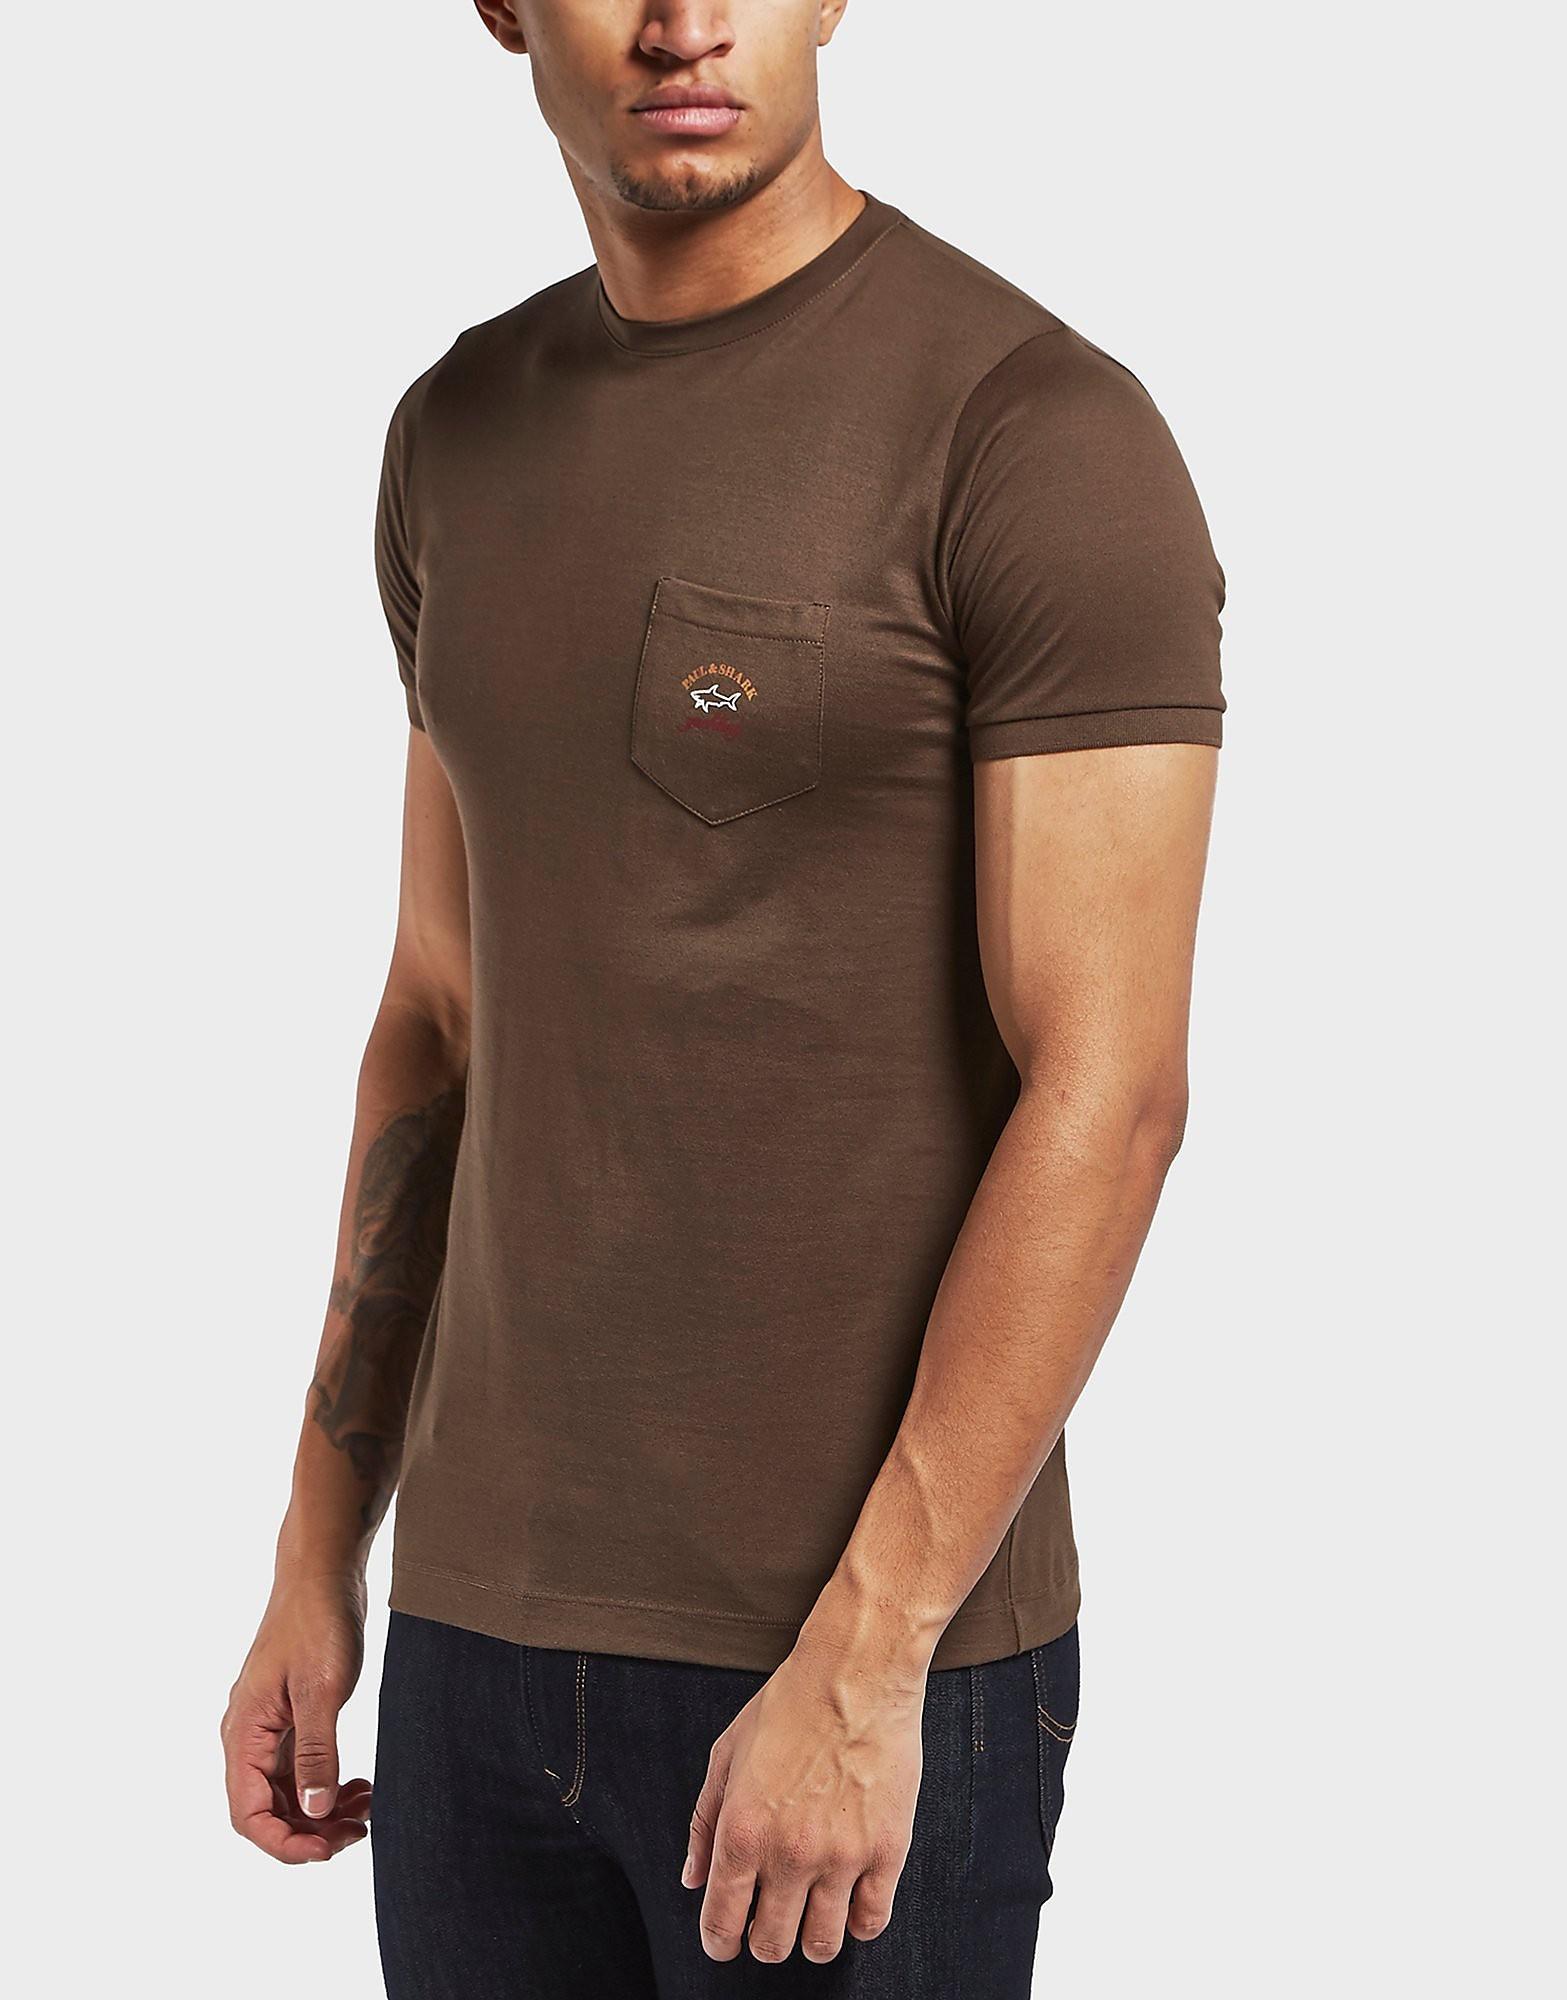 Paul and Shark Pocket Short Sleeve T-Shirt - Exclusive